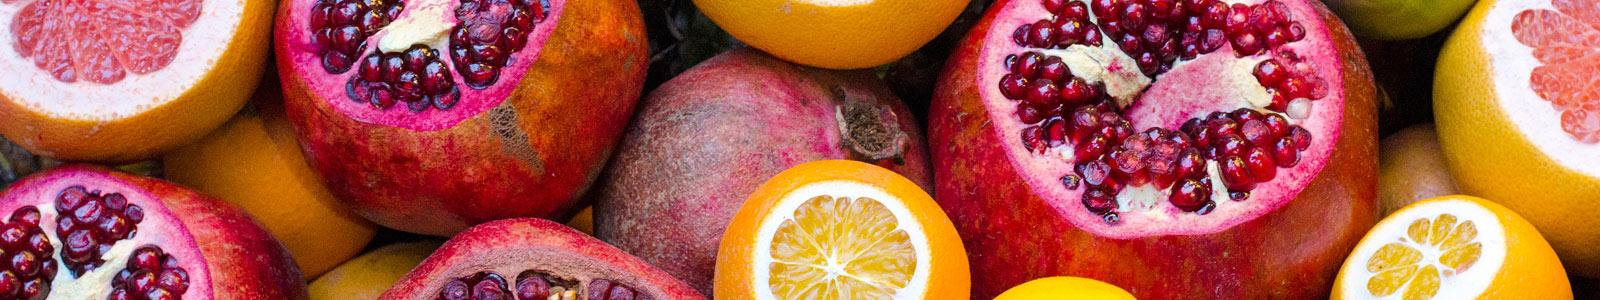 Cremer svanedesign pomegranate